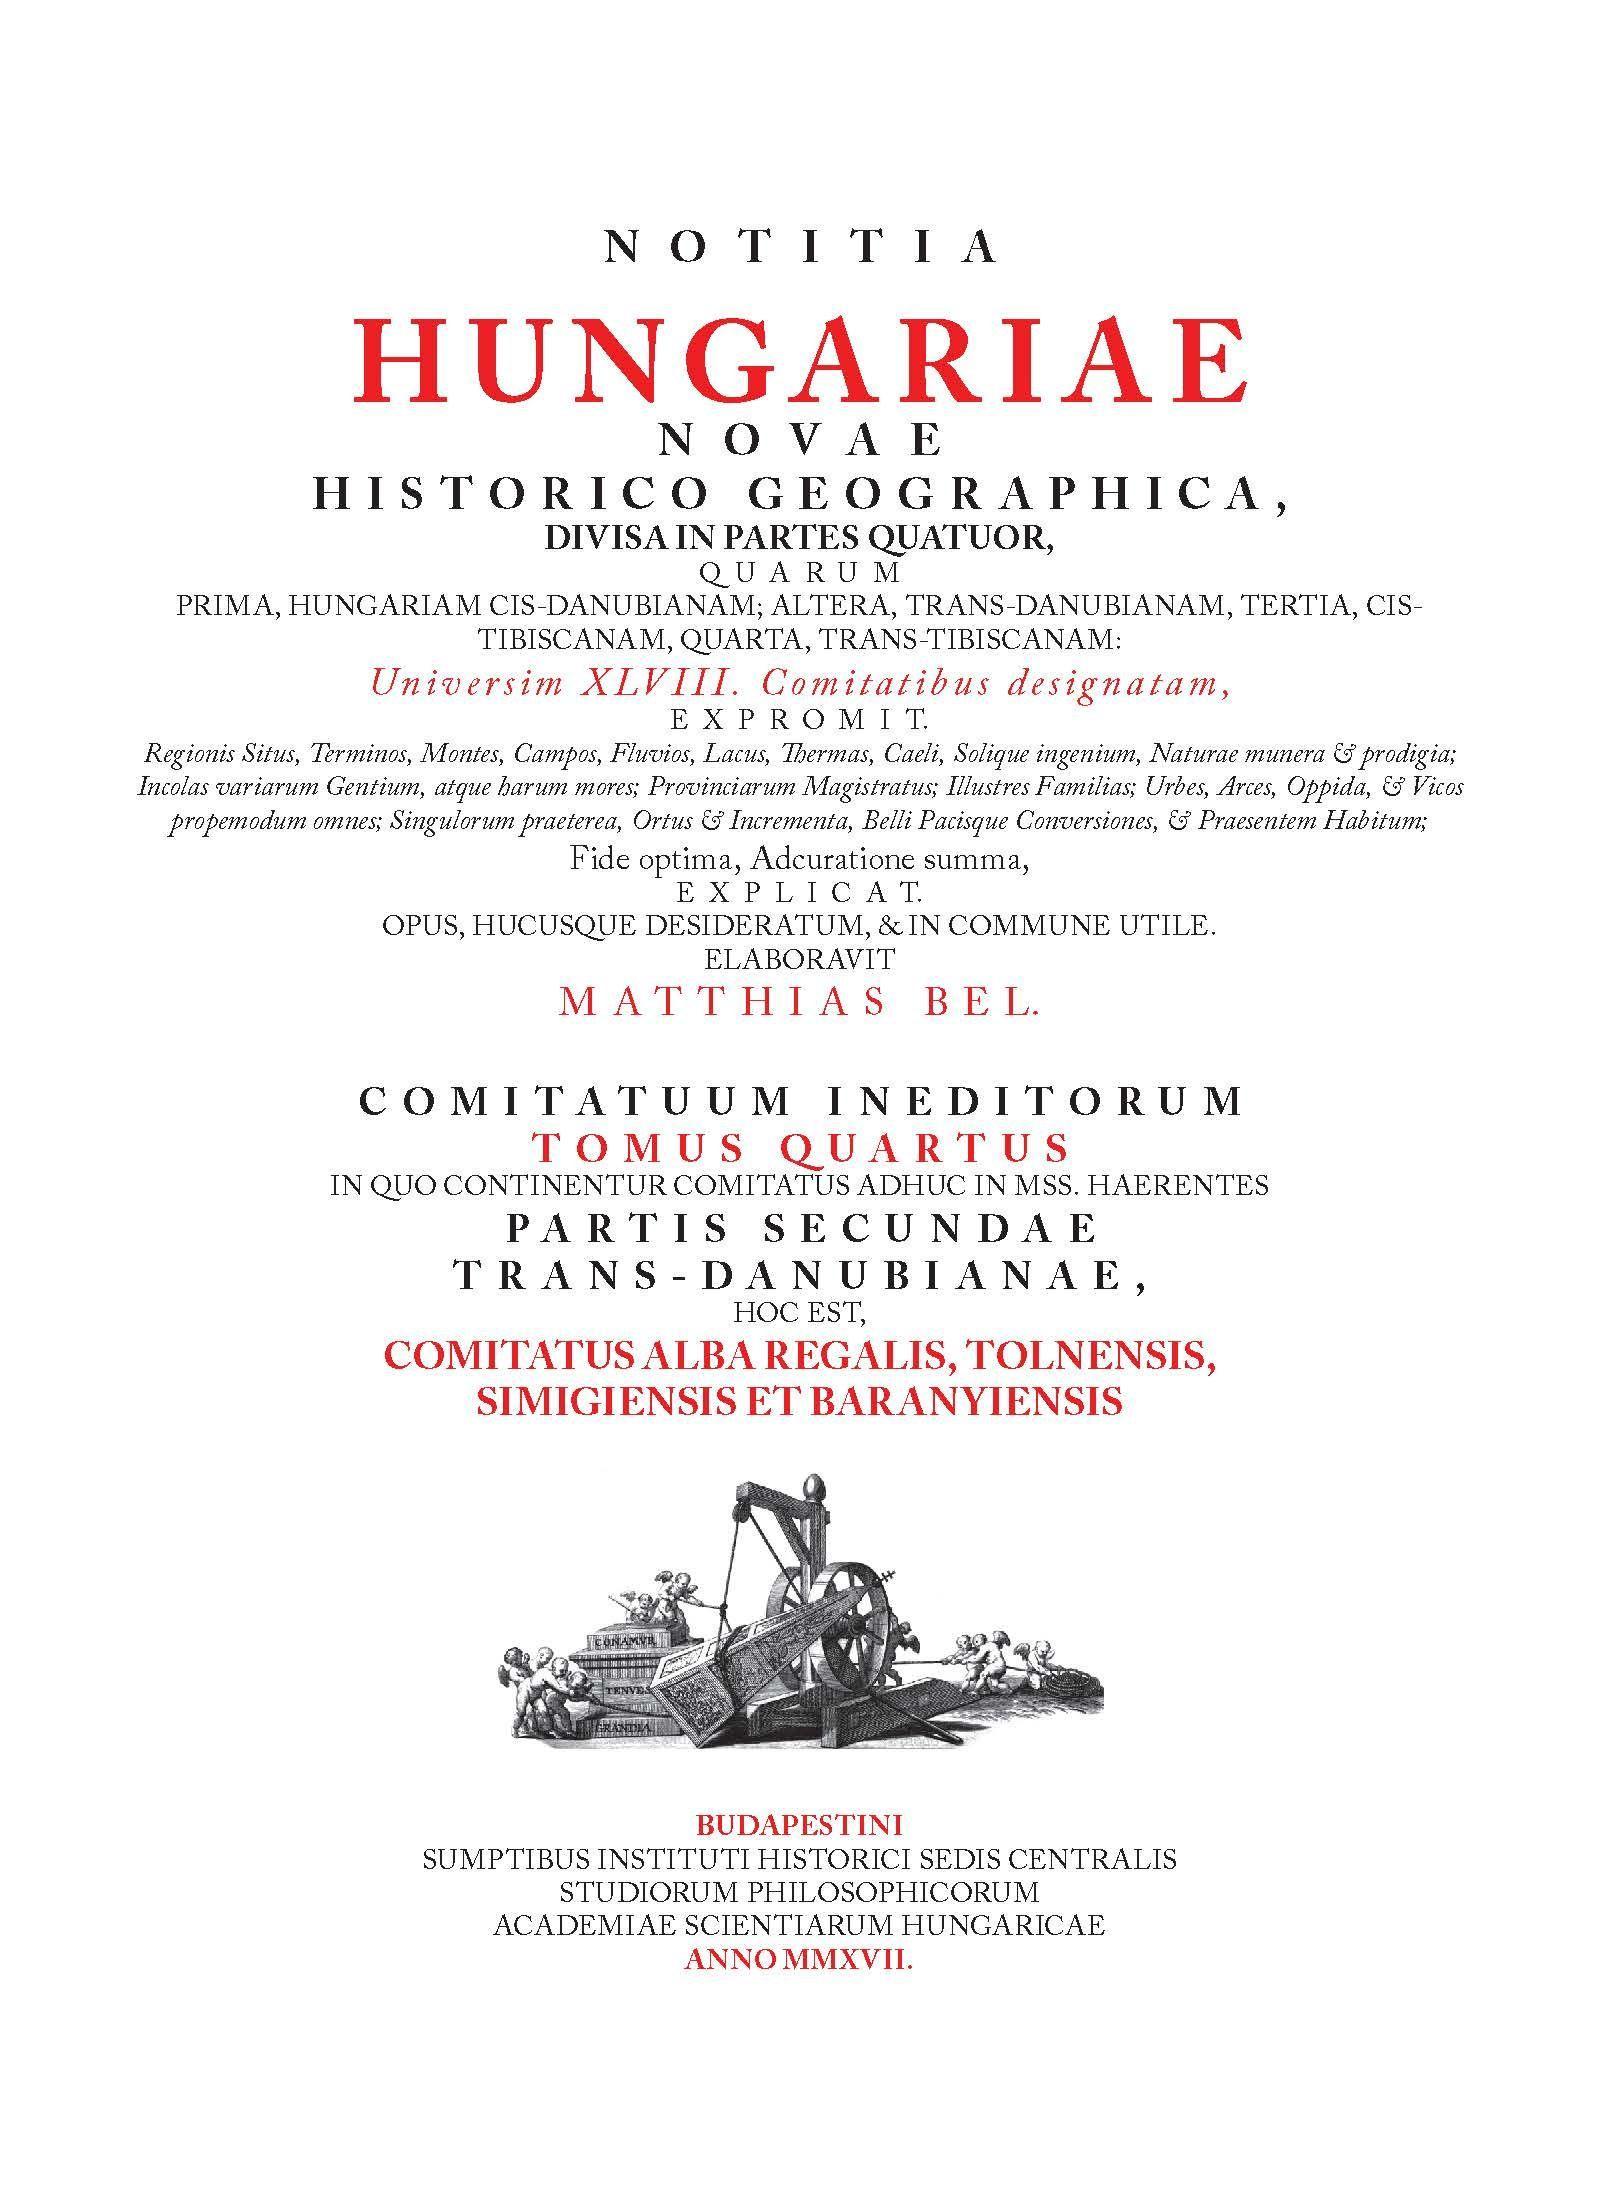 NOTITIA HUNGARIAE NOVAE HISTORICO GEOGRAPHICA… IV.